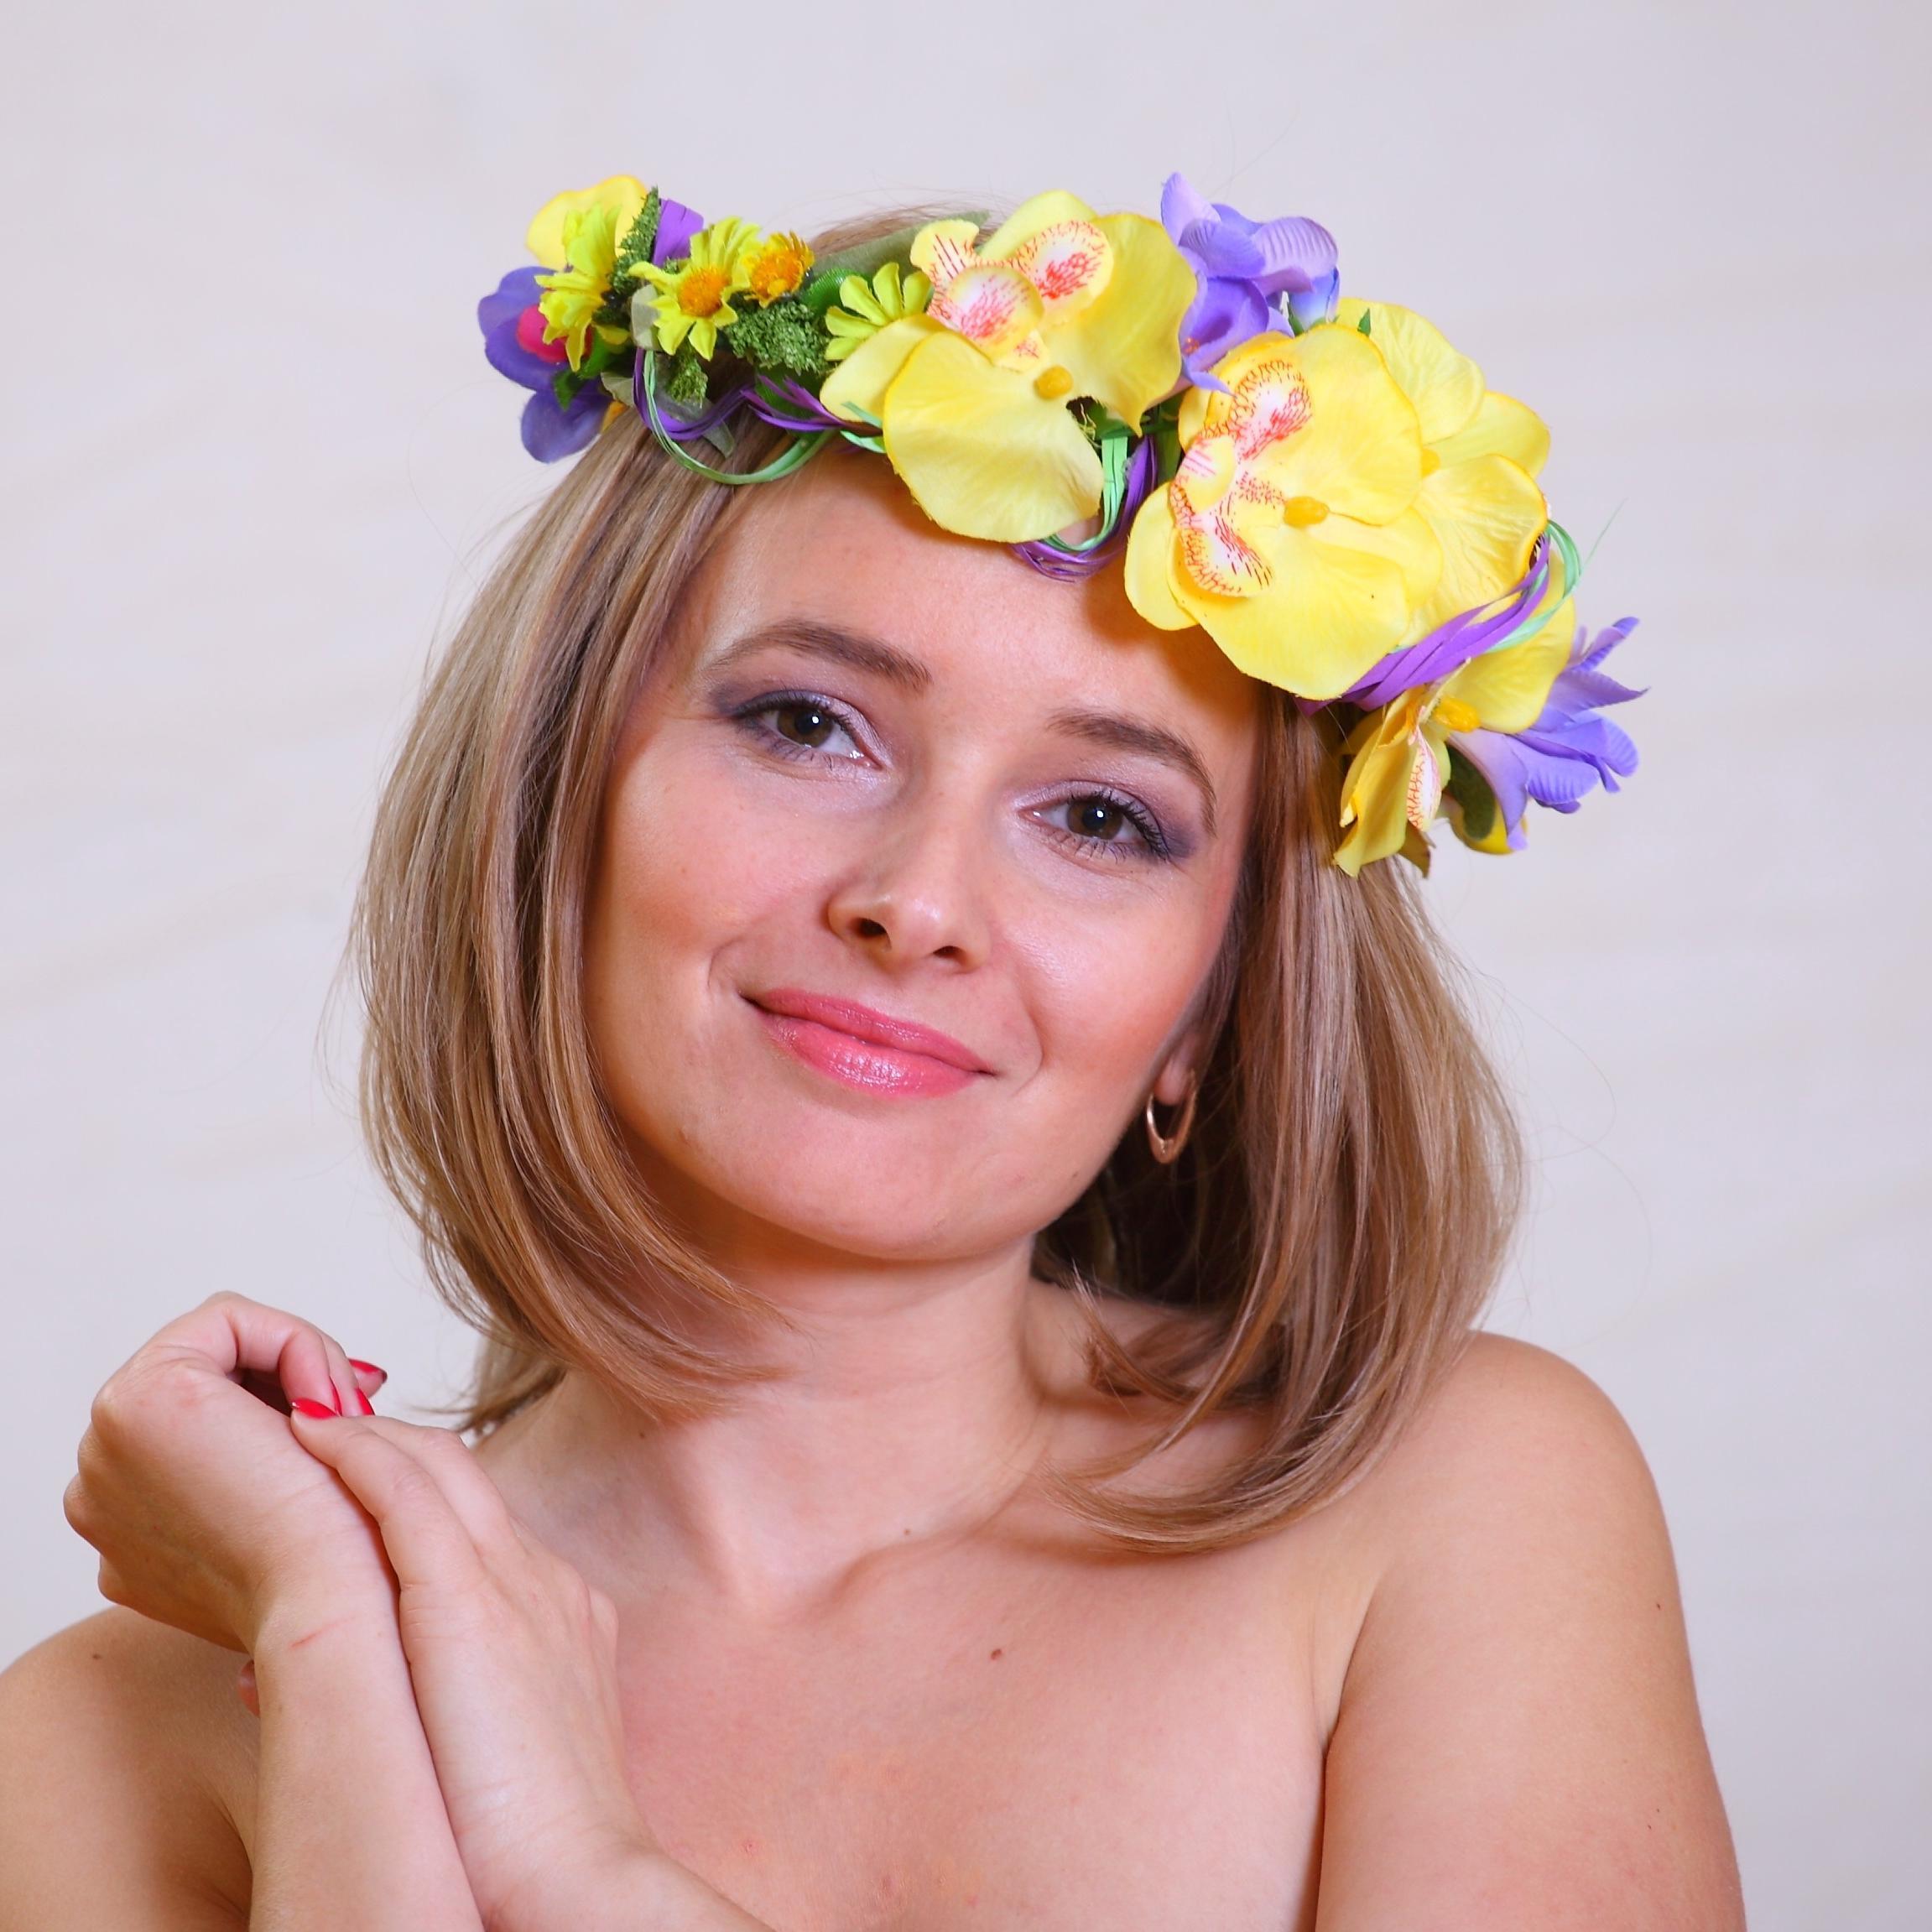 Video Oksana Bondarenko nude (65 foto and video), Sexy, Sideboobs, Instagram, panties 2018